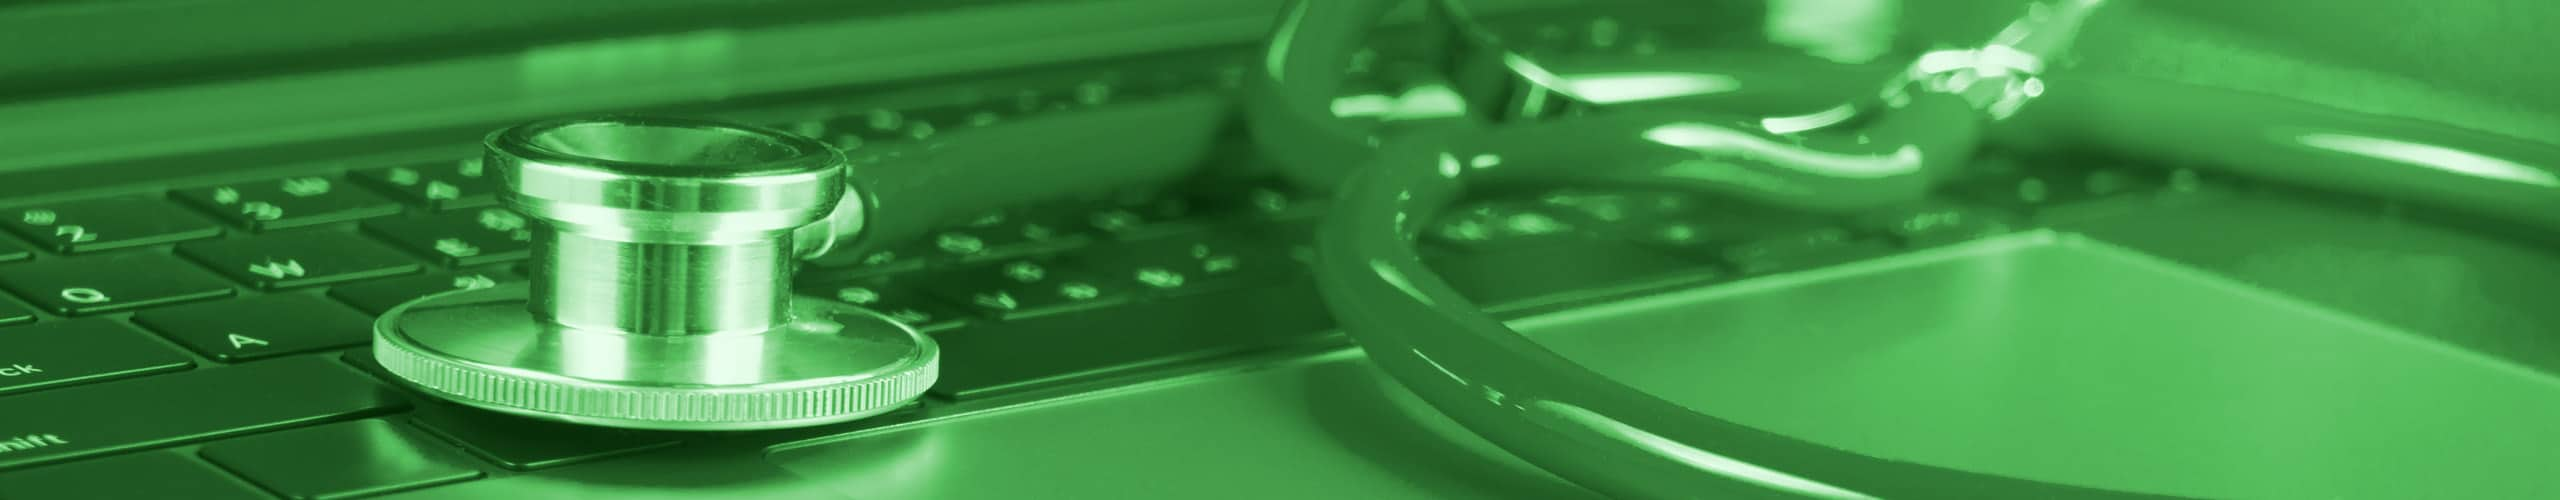 permSECURE - Cybersecurity im Krankenhaus